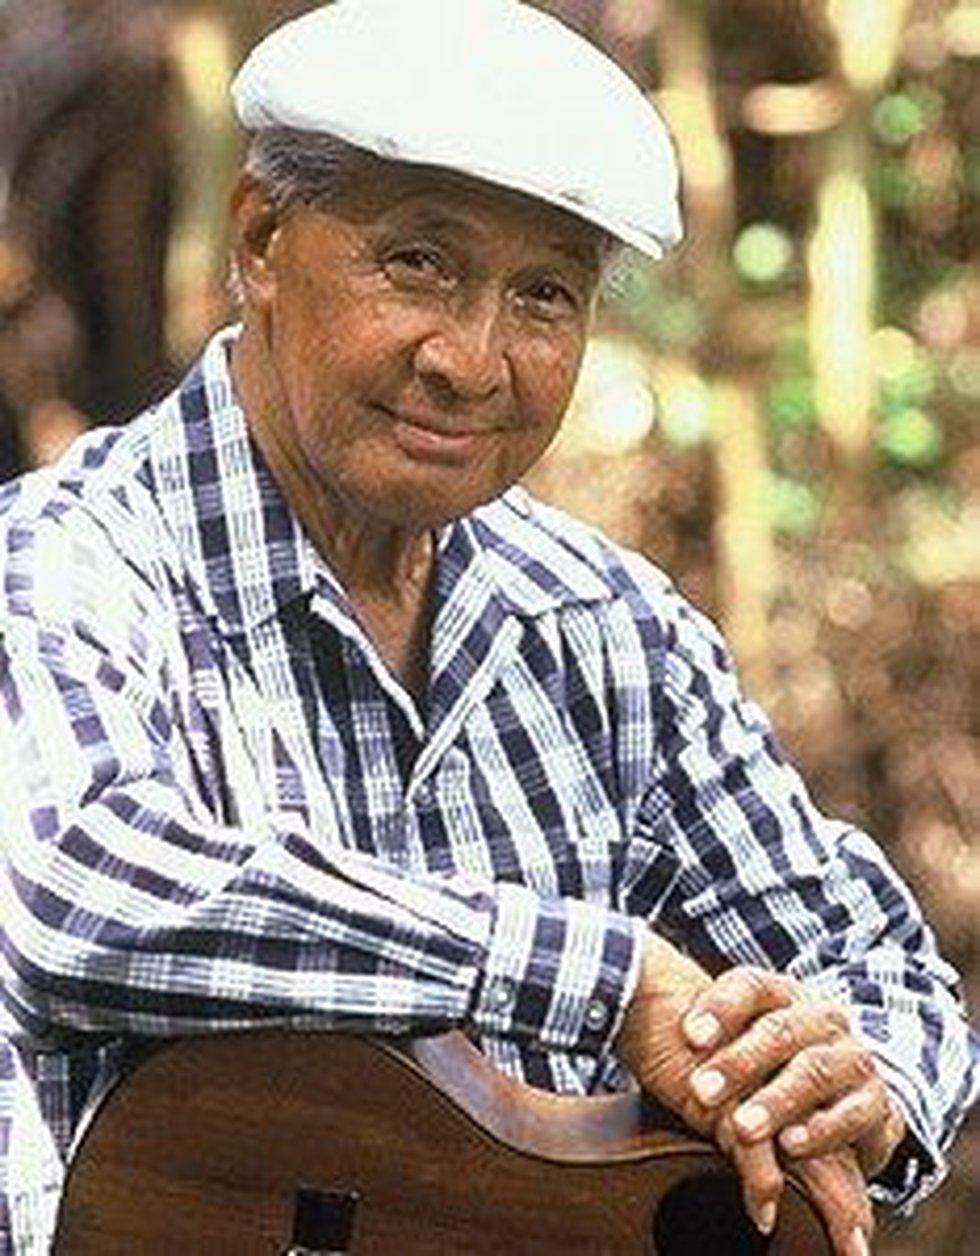 (Image: Sons of Hawaii)